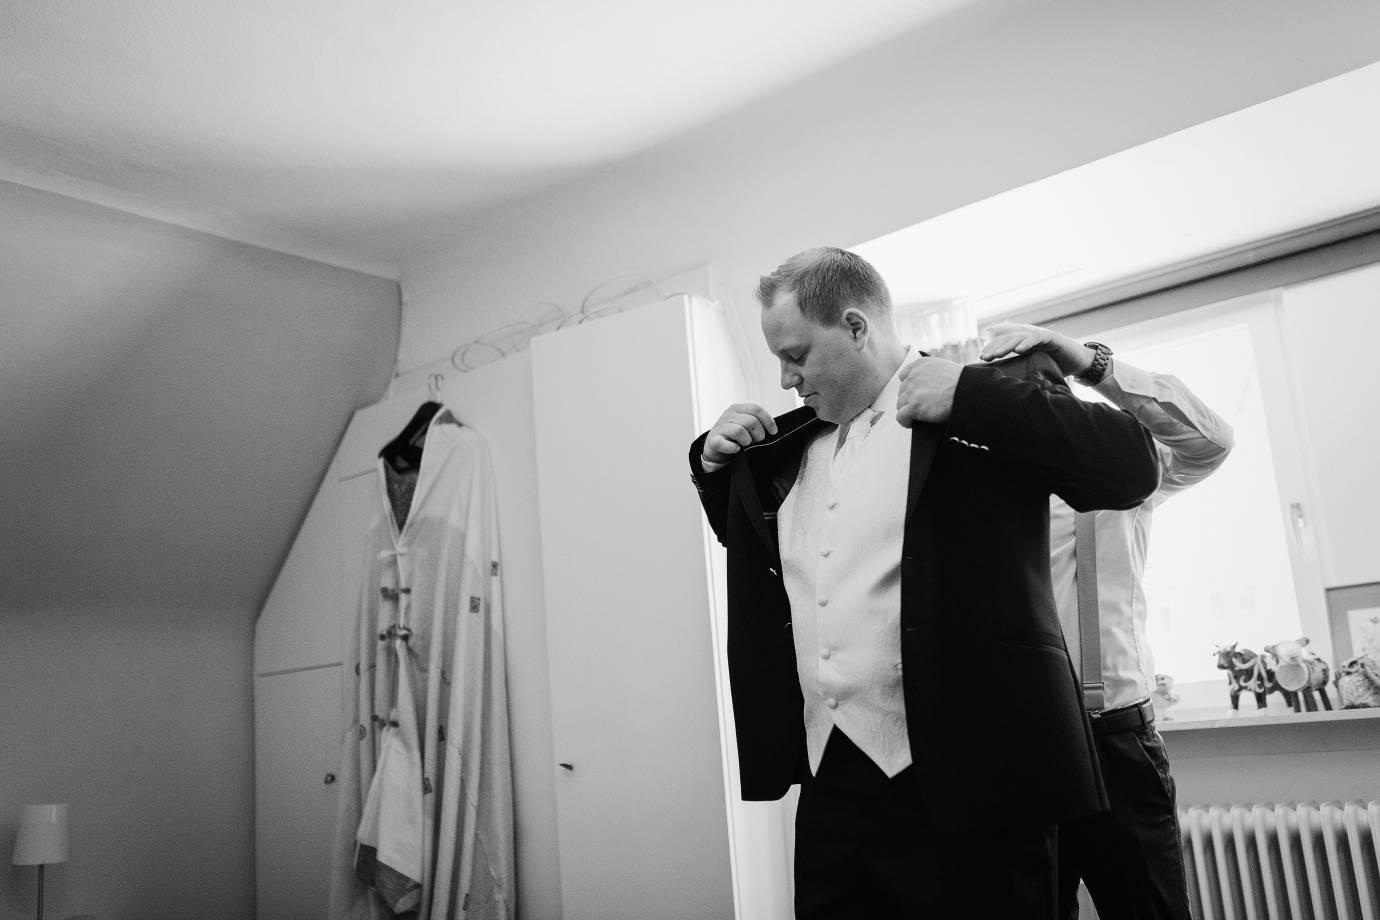 hochzeitsfotograf lilienthal 007 - Mareike+Thomas